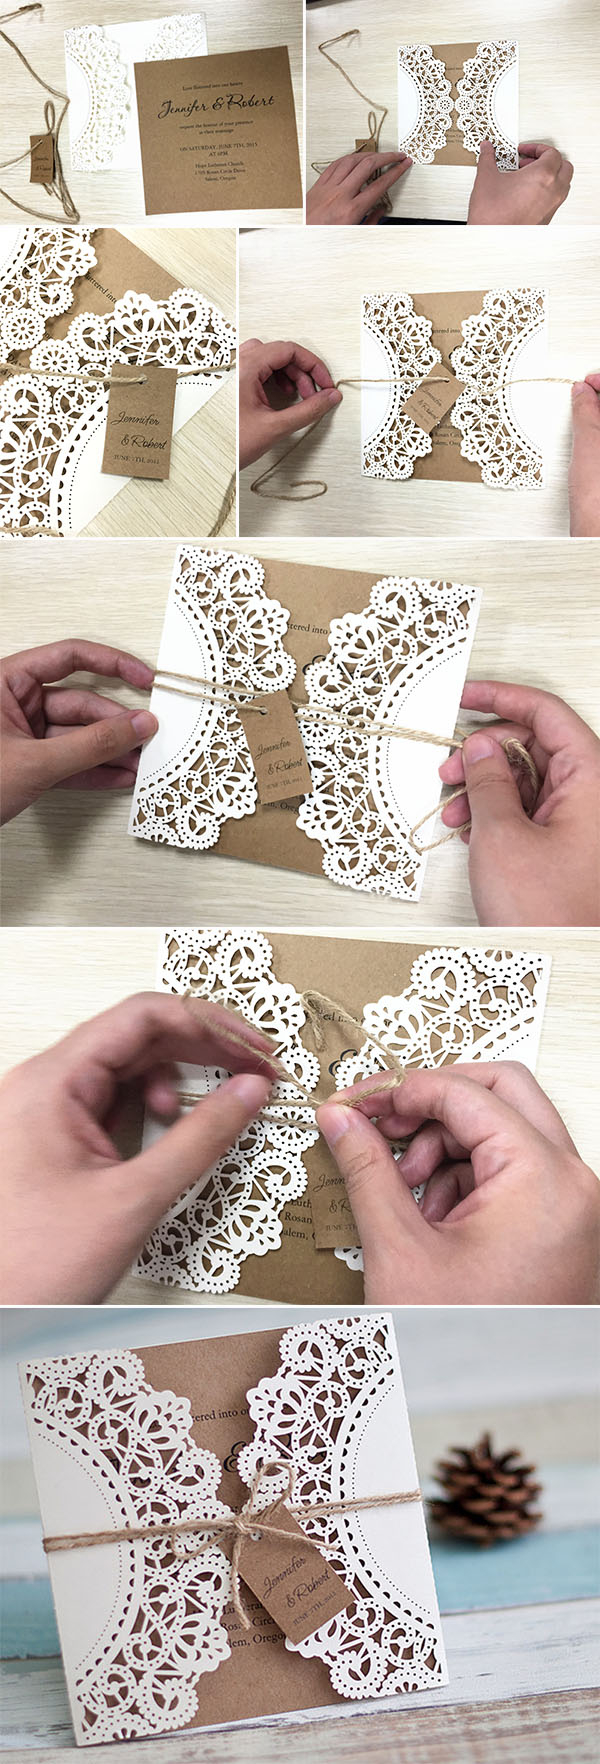 Diy Wedding Invitations Ideas Diy Wedding Ideas 10 Perfect Ways To Use Paper For Weddings